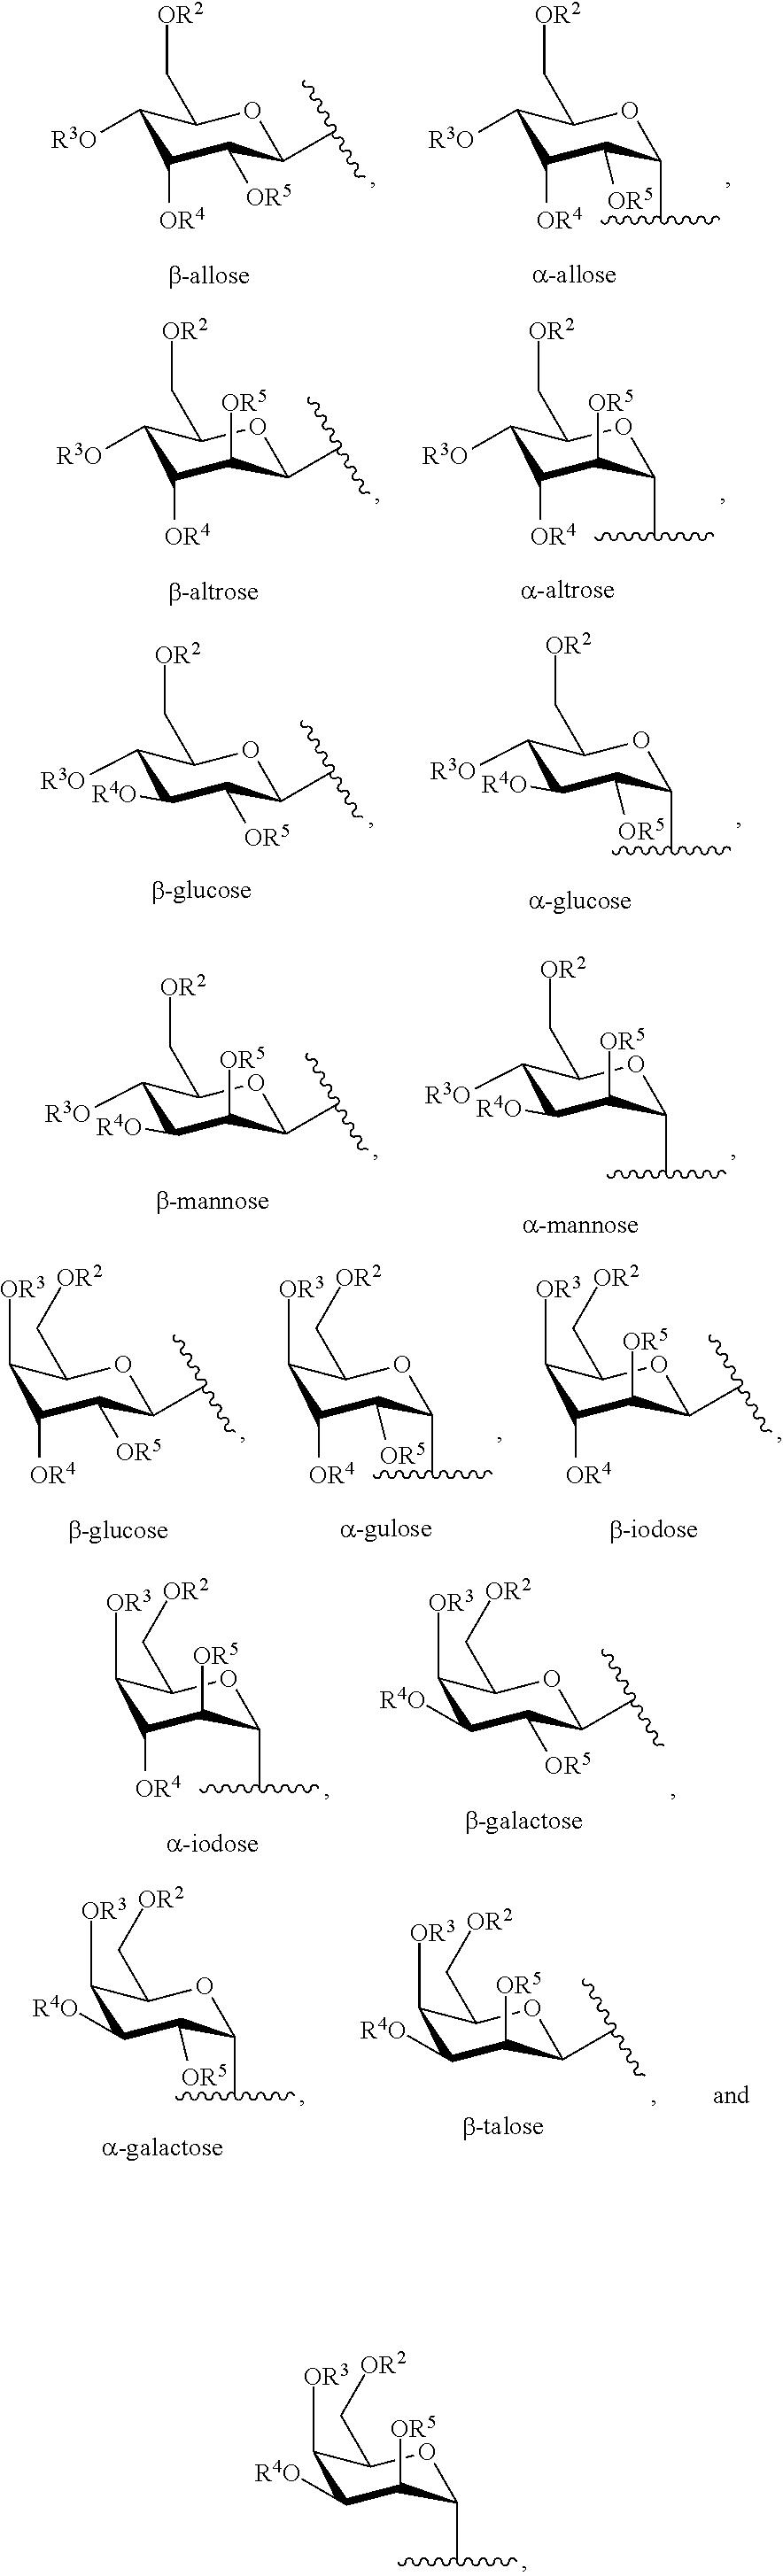 Us9611286b2 Ruthenium Carbon Monoxide Releasing Molecules And Uses Wk Hemi Engine Compartment Diagram Figure Us09611286 20170404 C00011